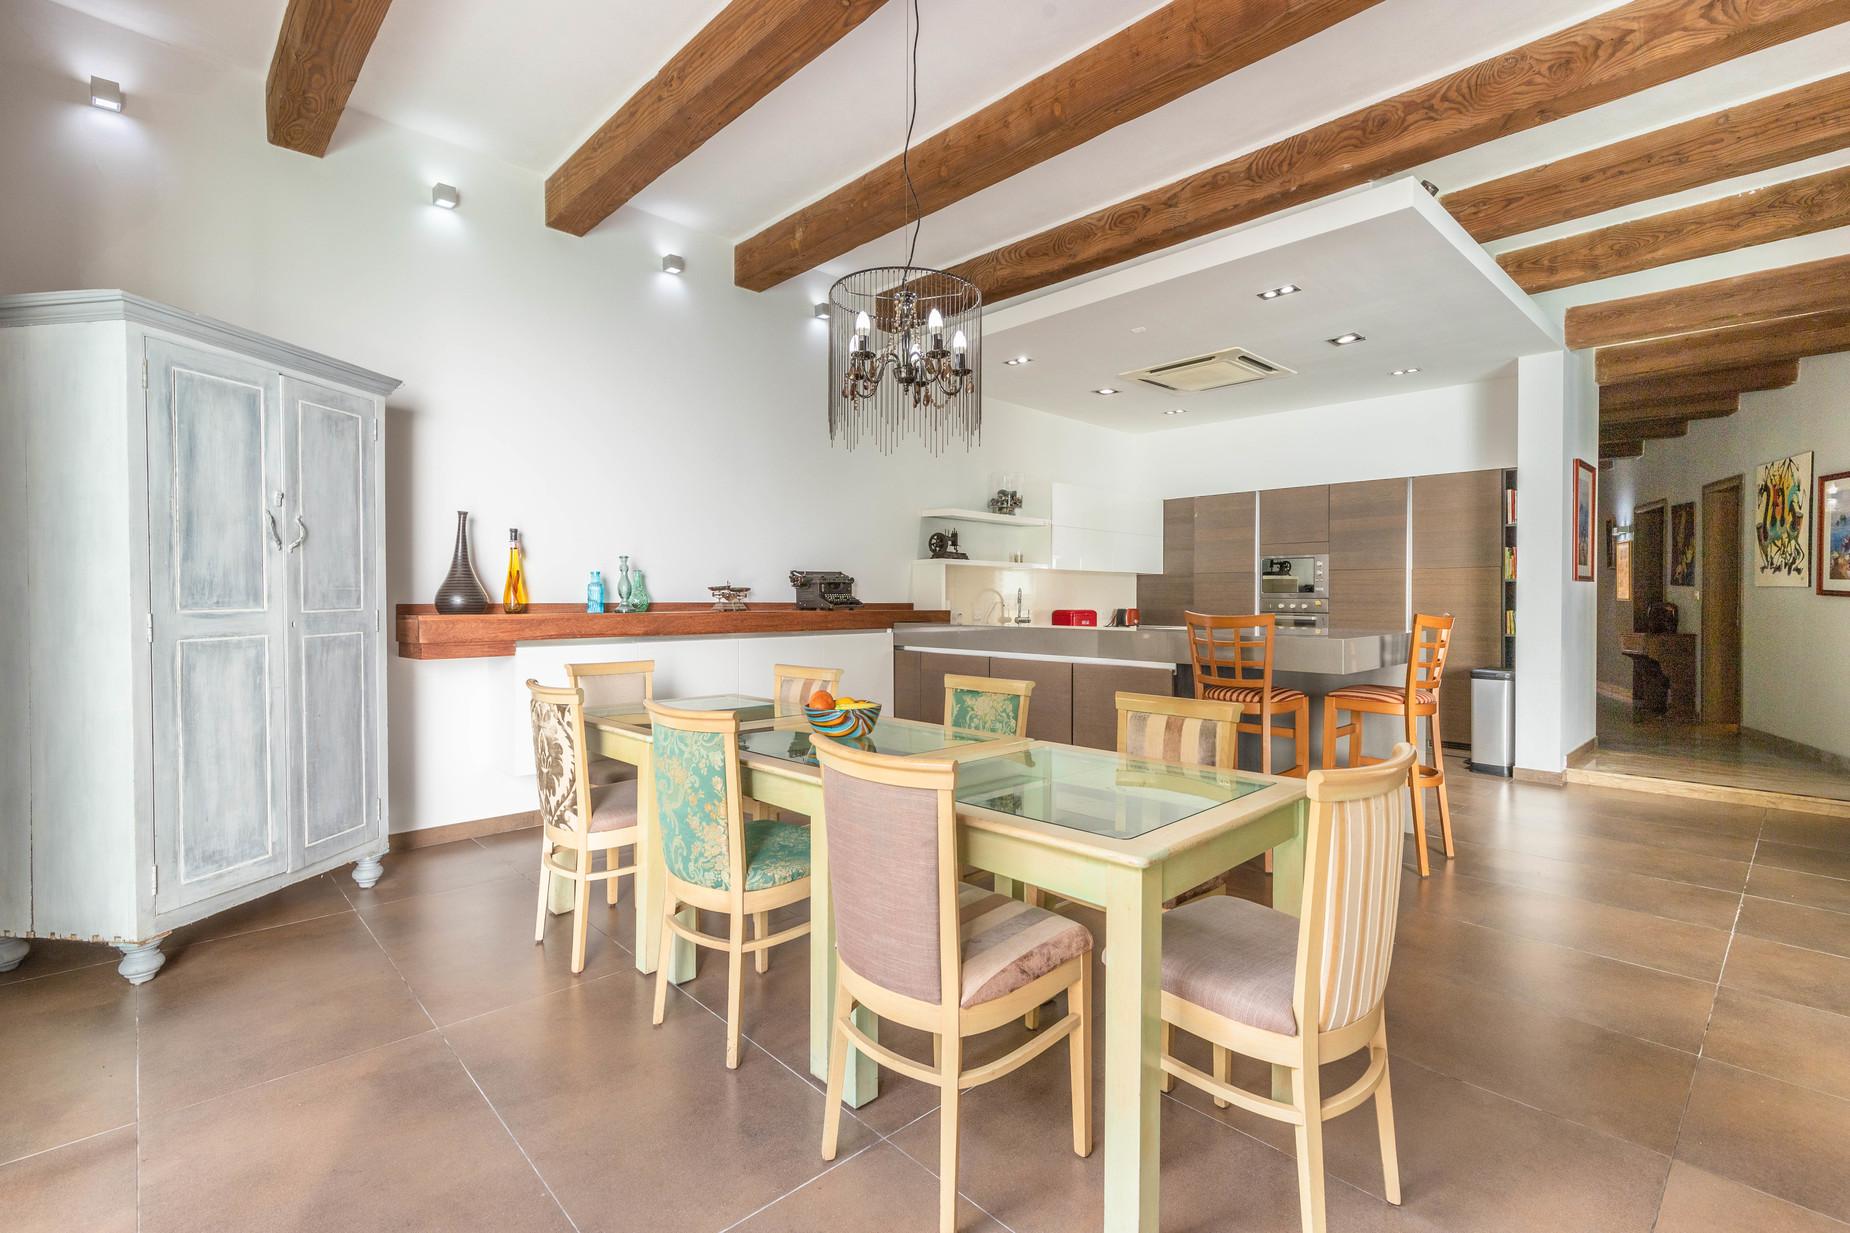 5 bed Villa For Sale in Zebbug, Zebbug - thumb 3